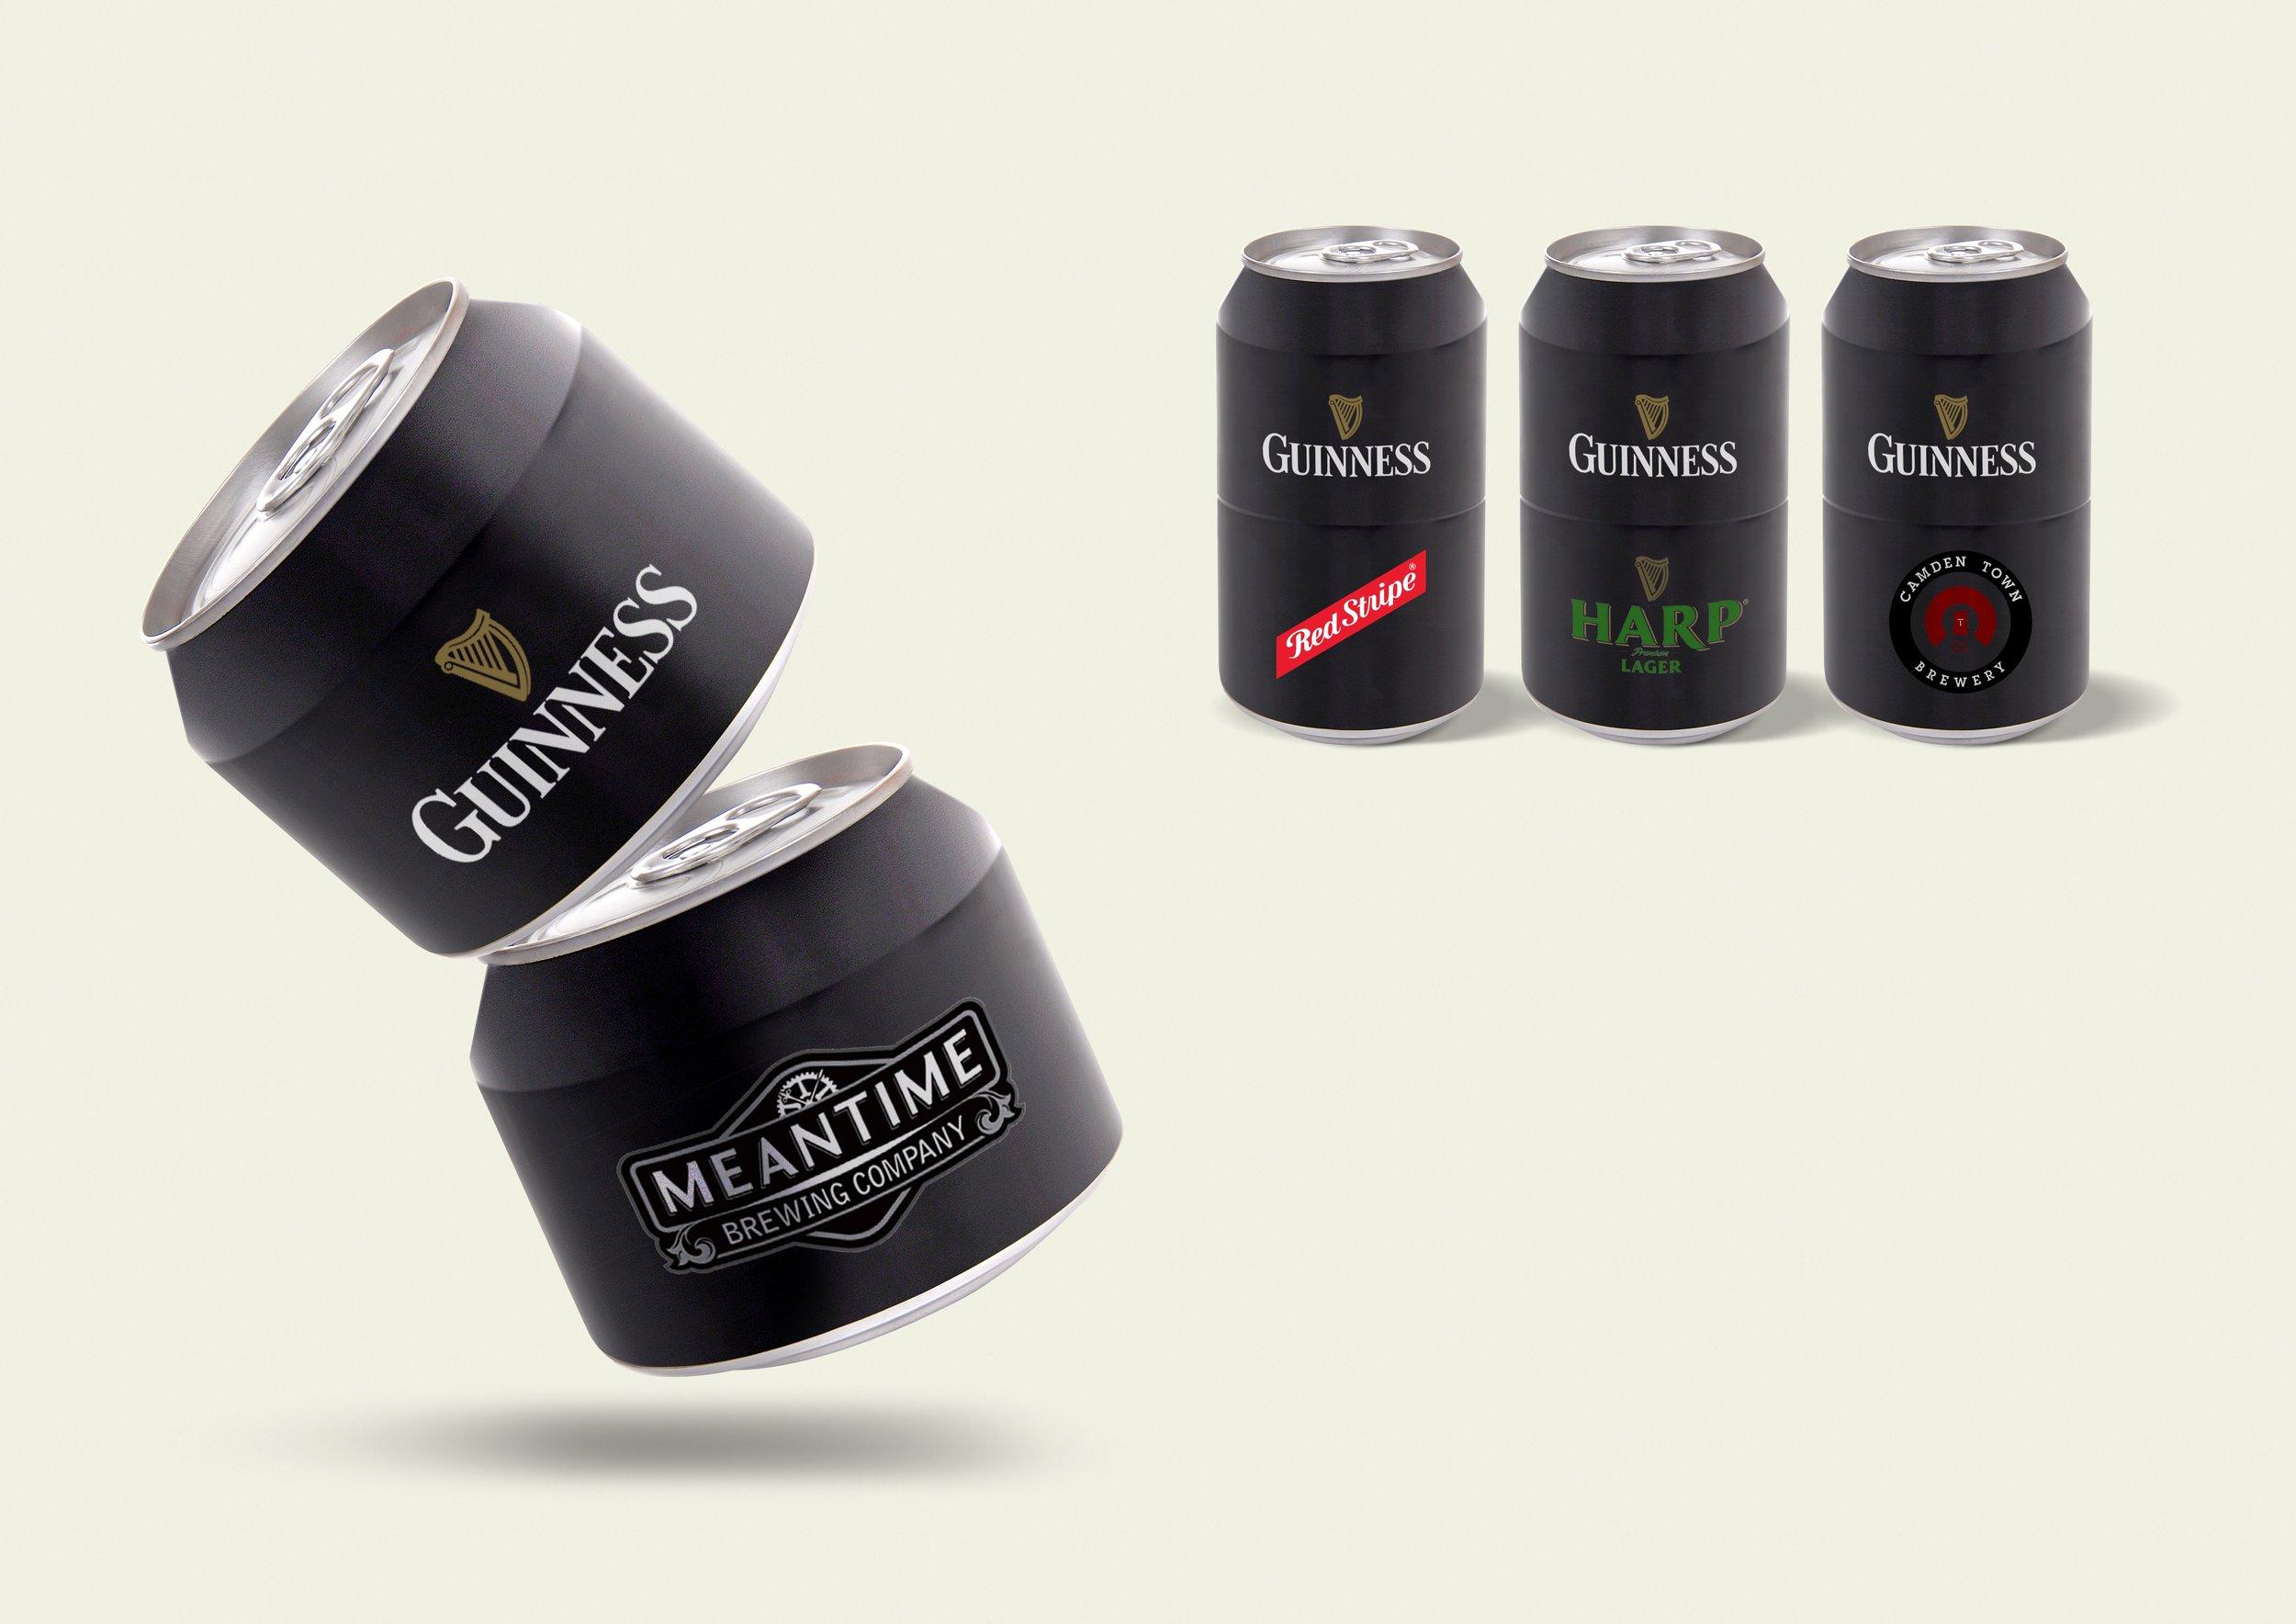 Guinness_PreMix_Half&Half-2.jpg